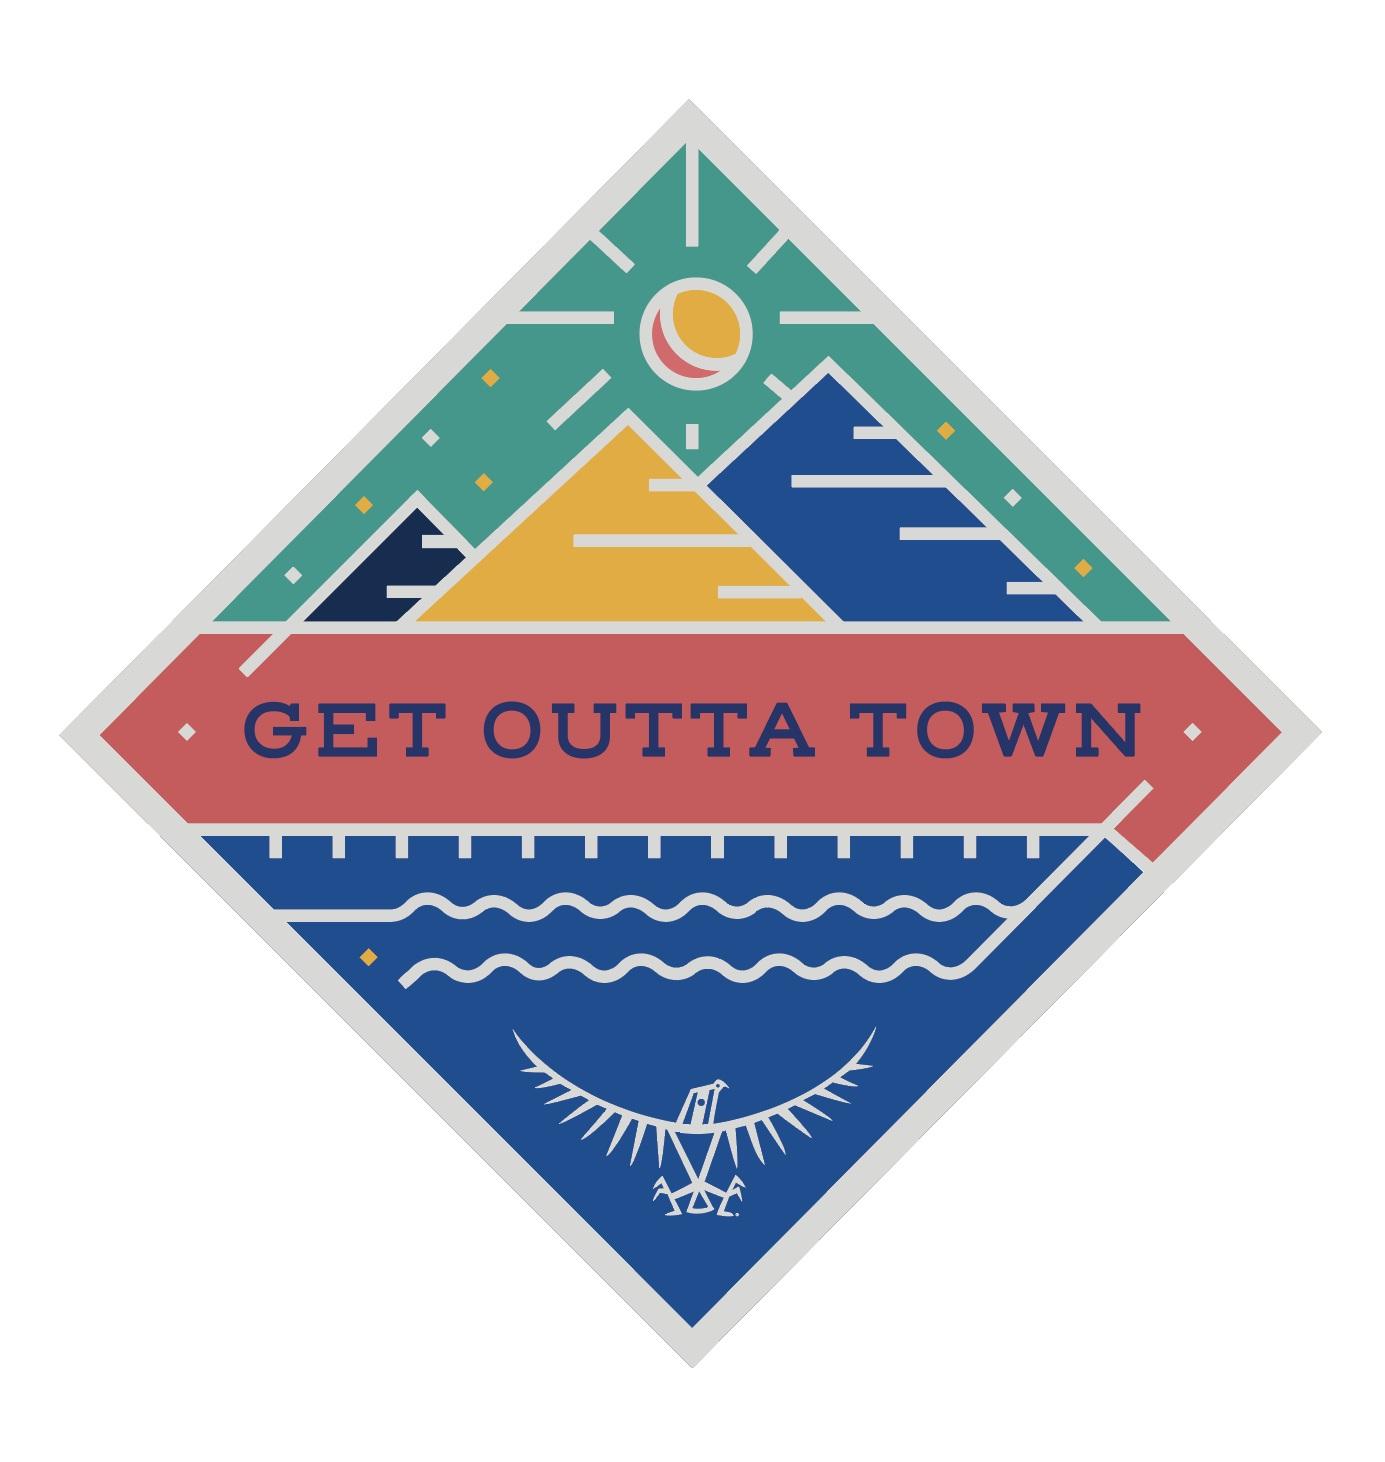 GetOuttaTown.png